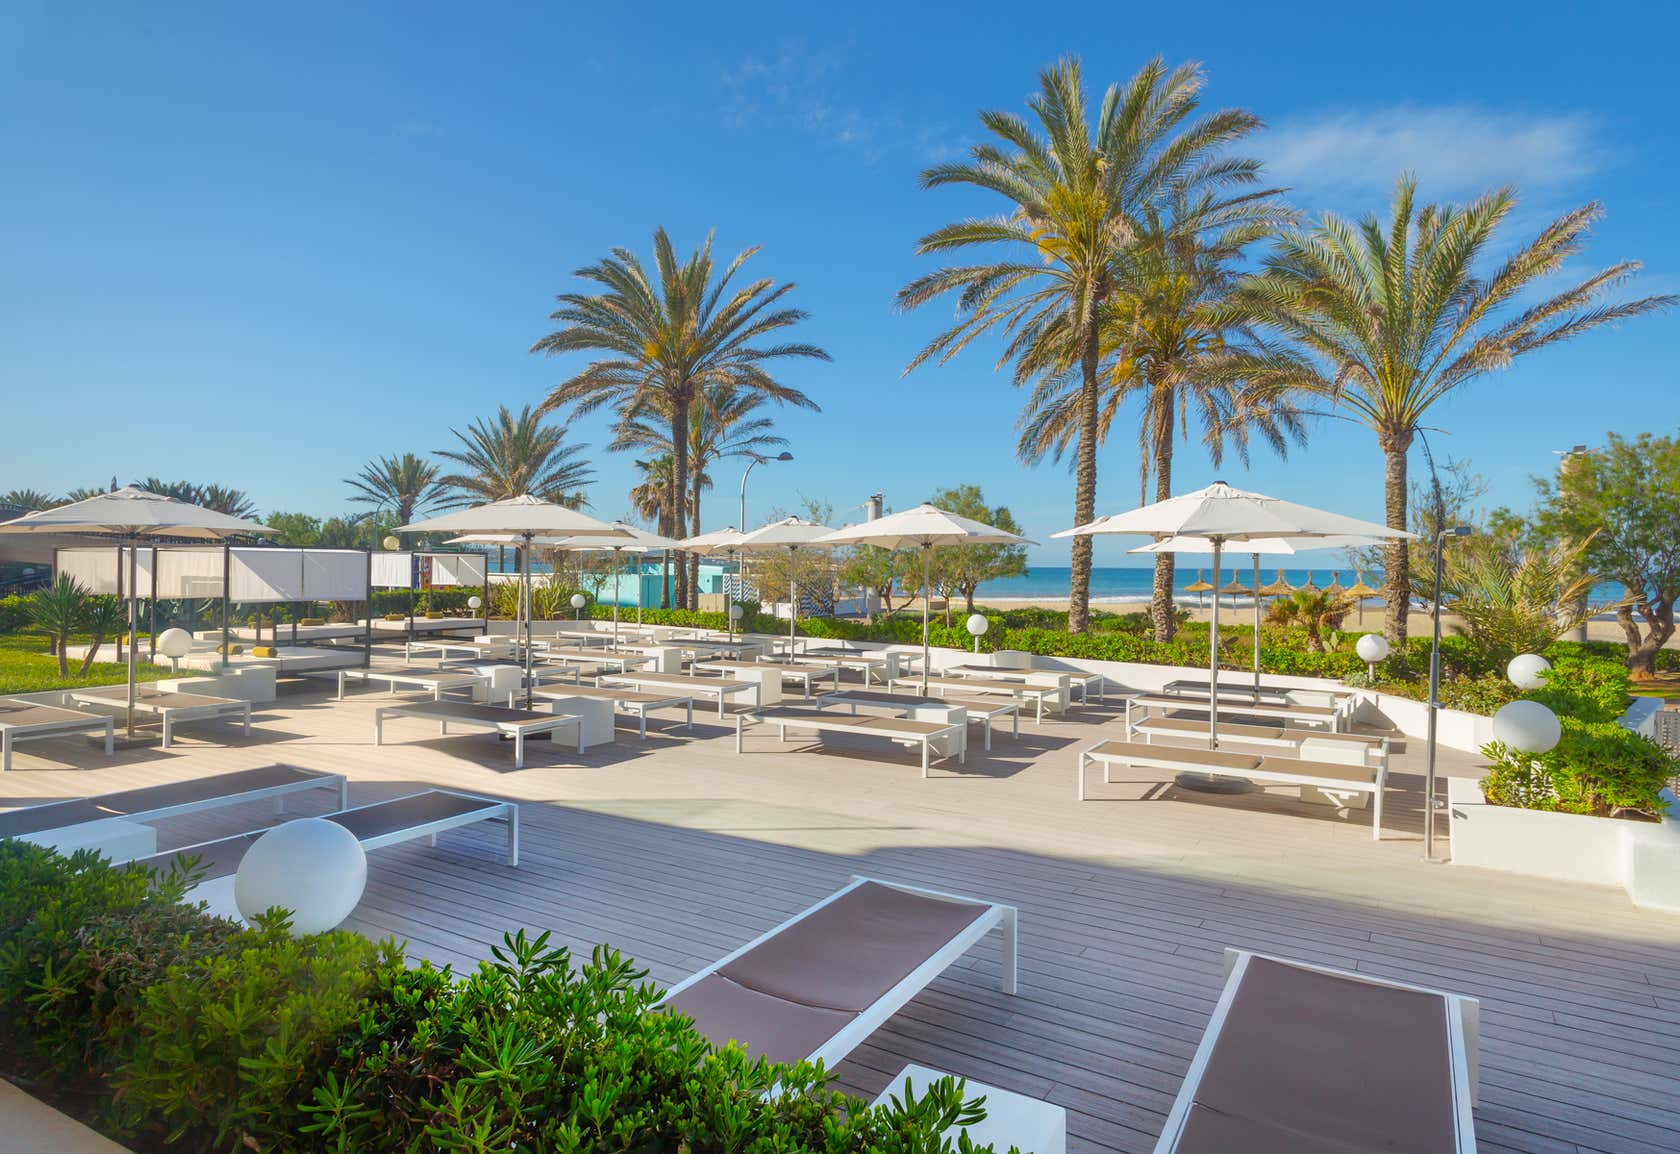 HM Tropical Hotel